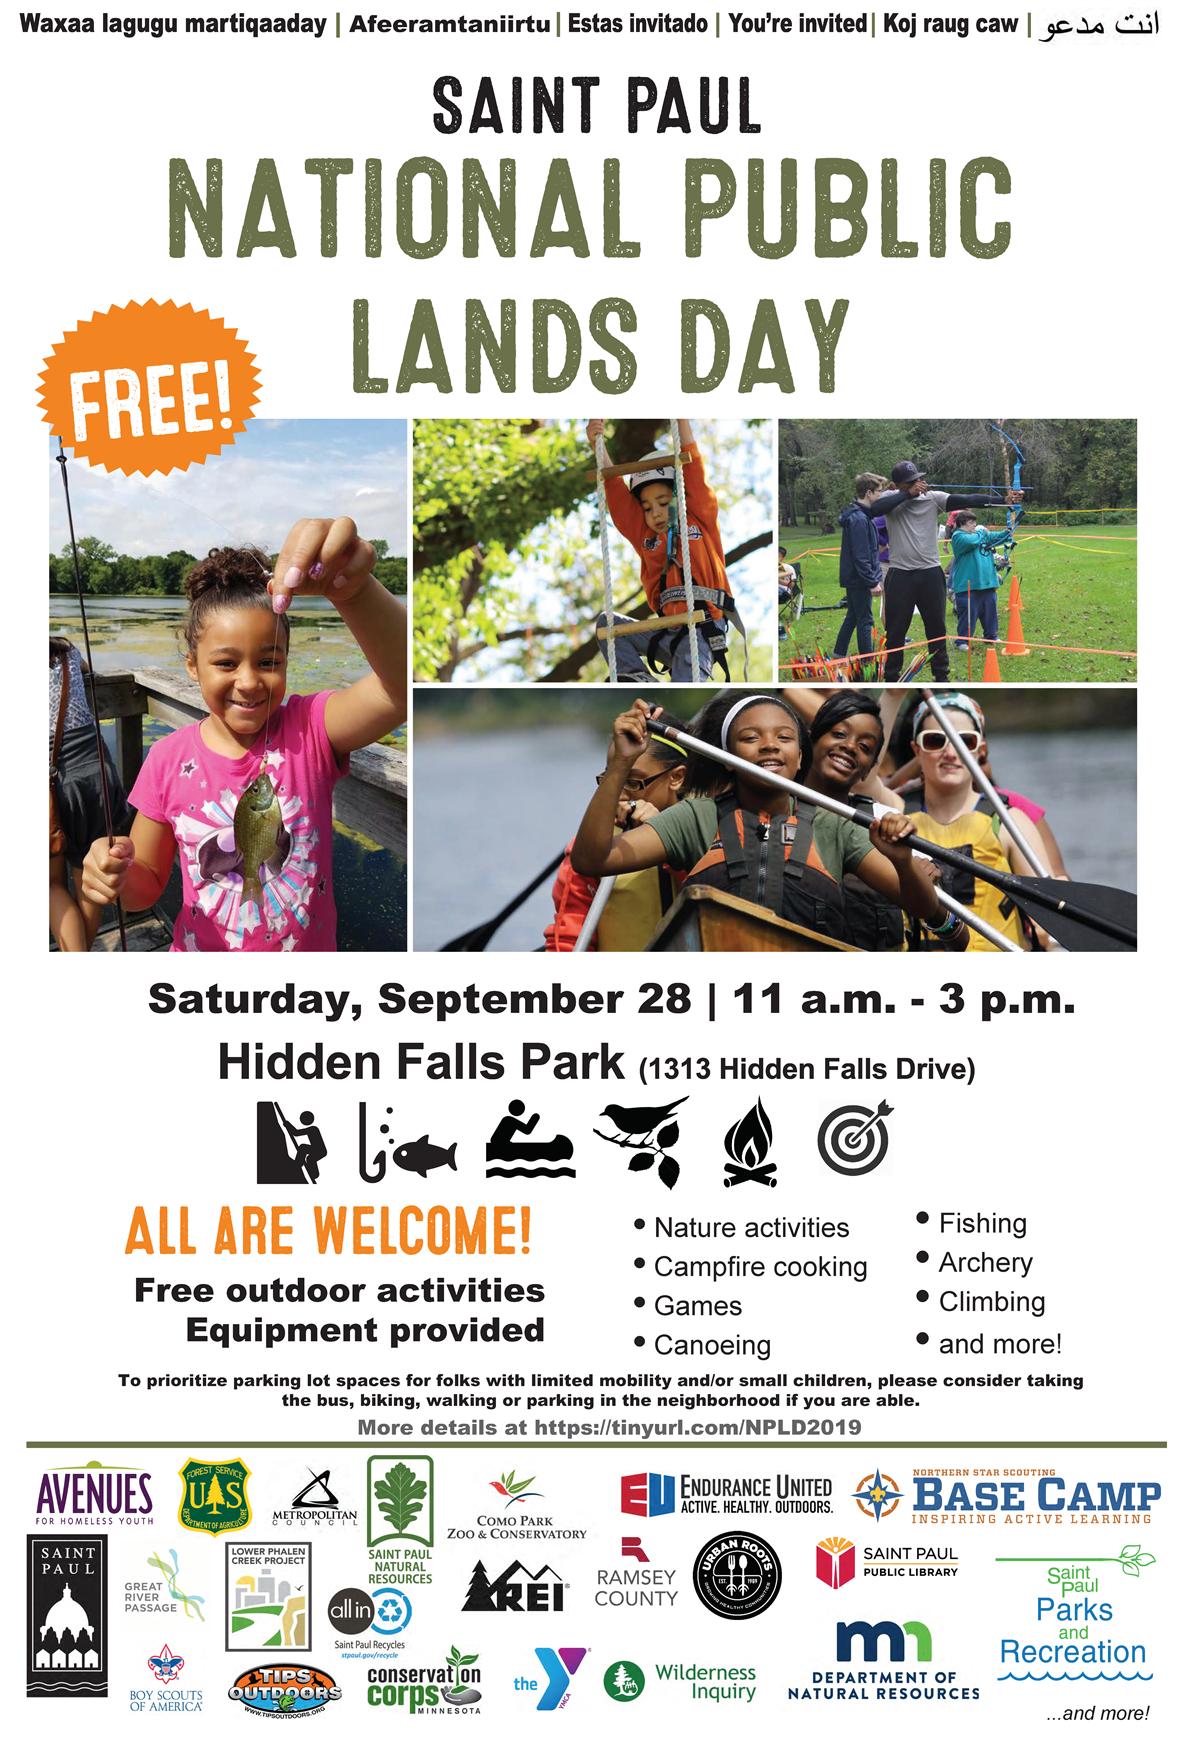 National Public Lands Day 2019 flyer